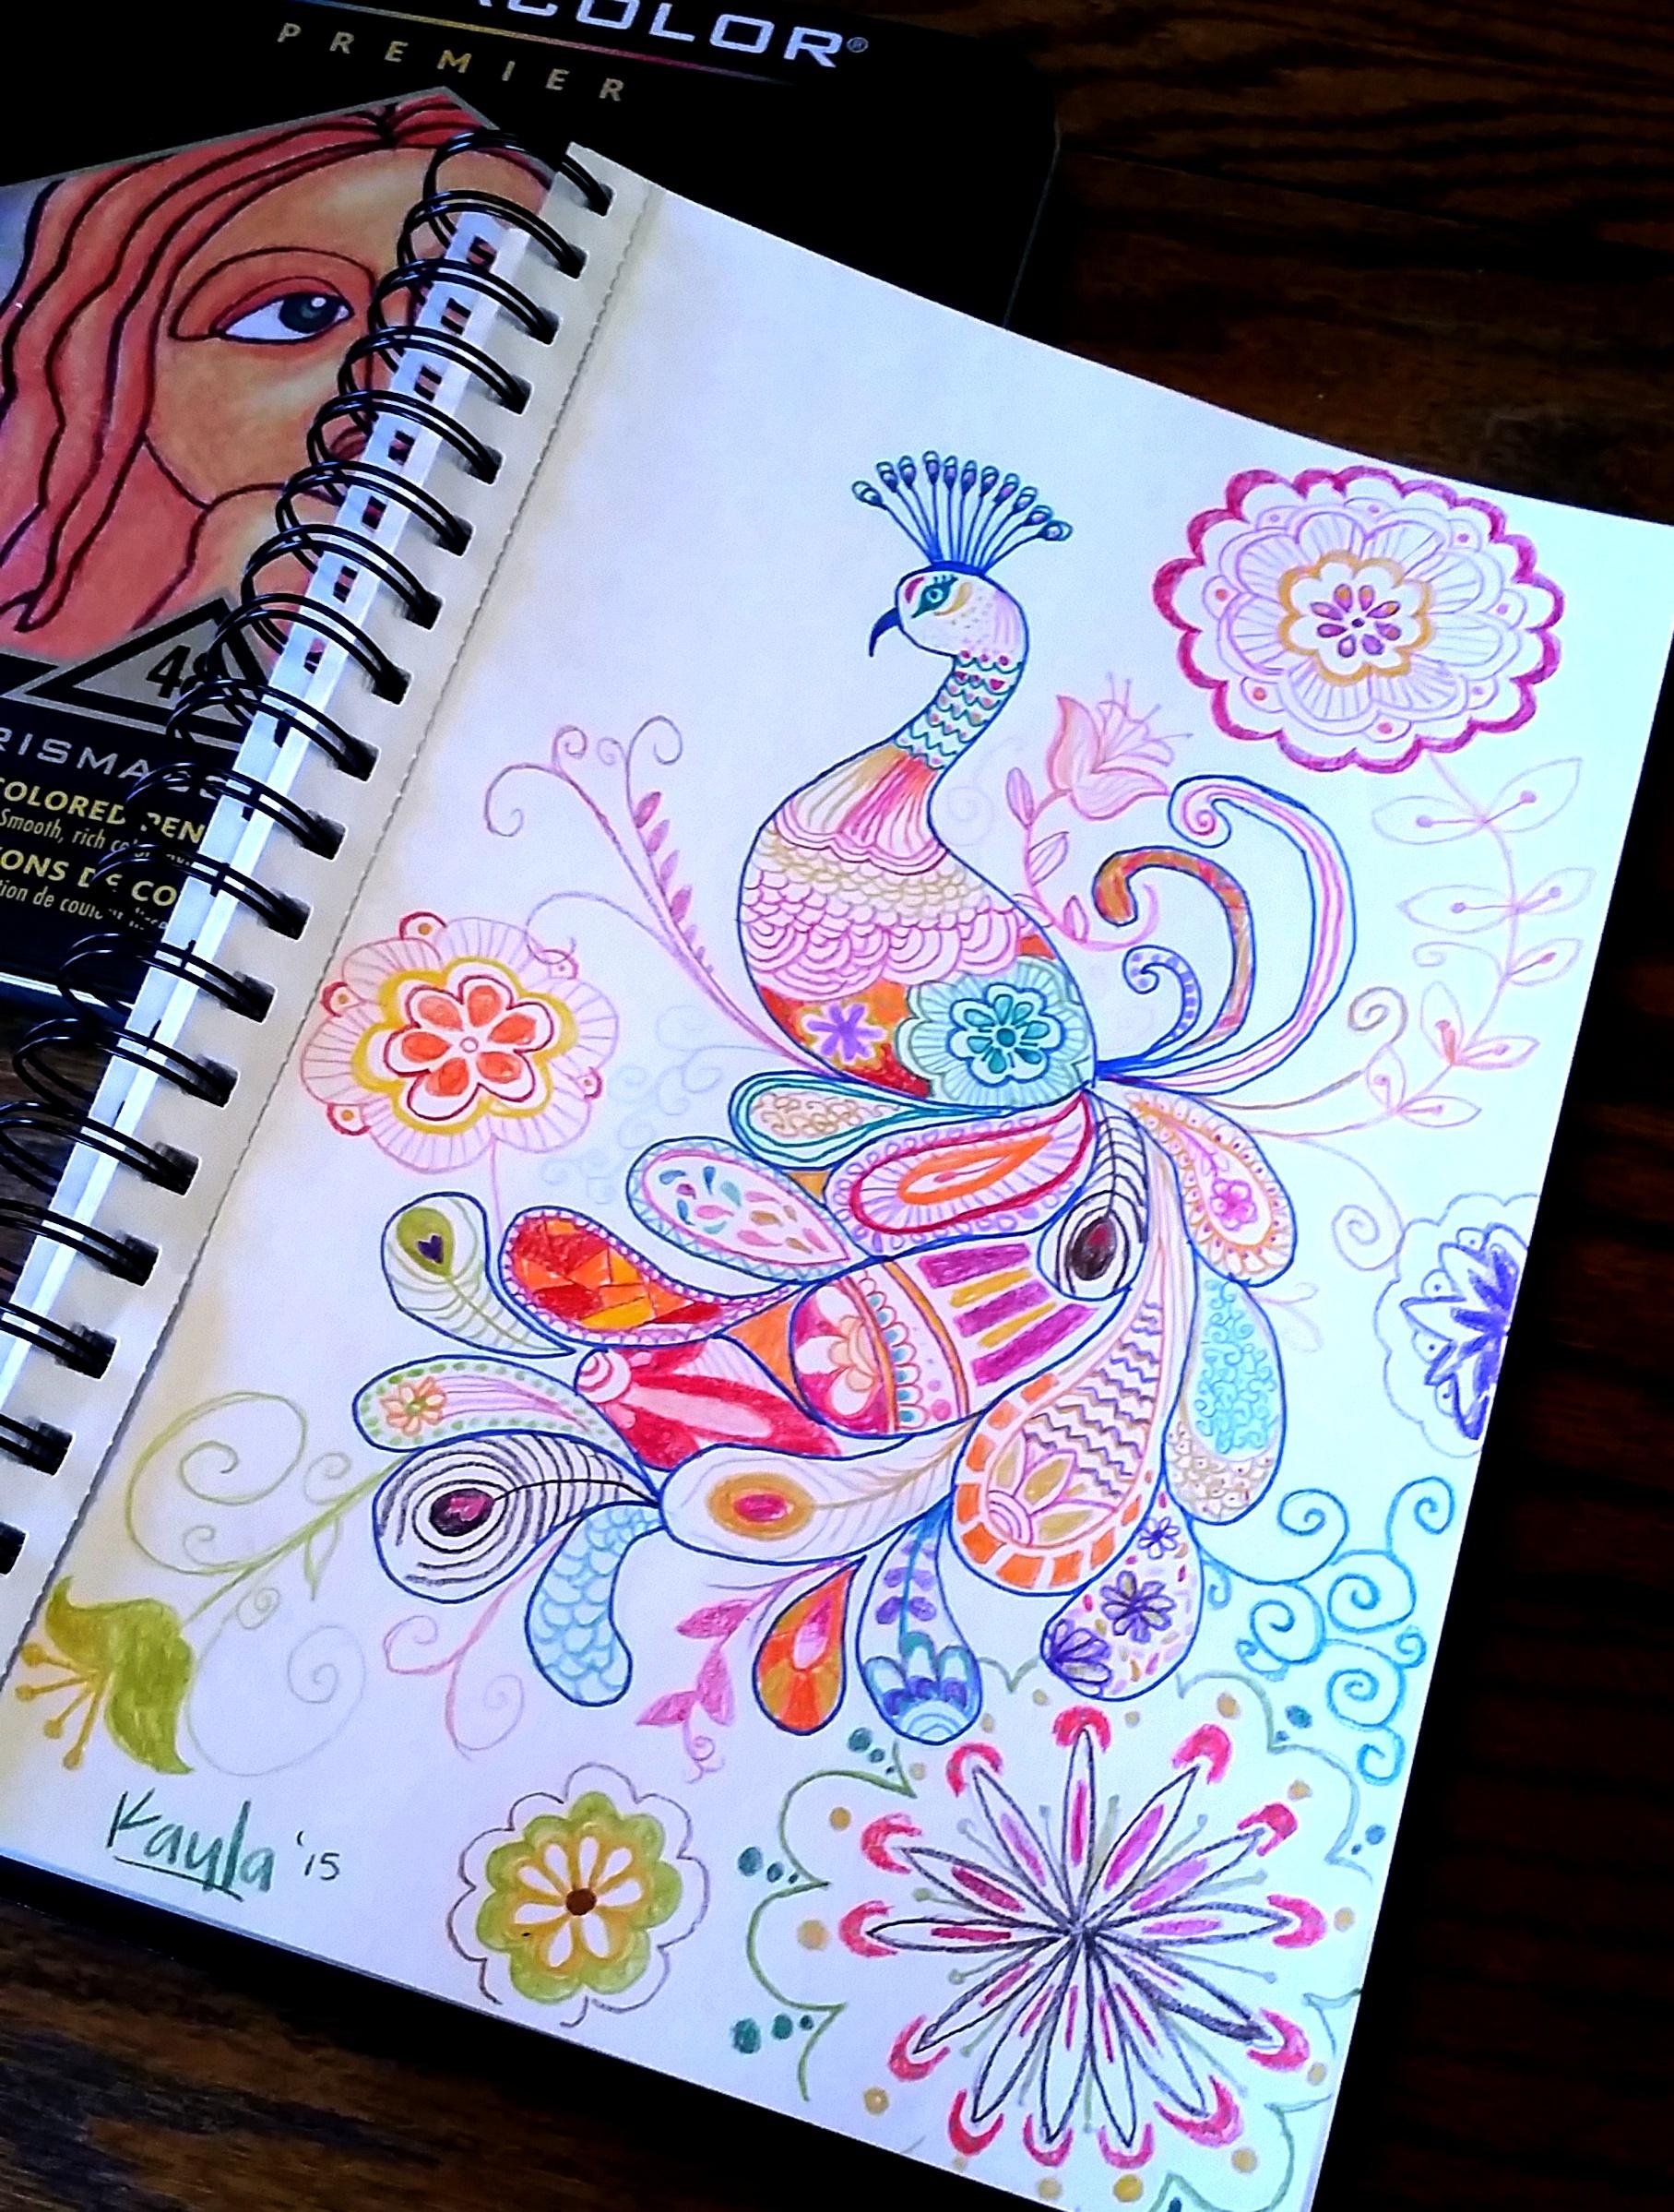 1815x2398 Coloured Sketch Pen Drawing Colour Sketch Pen Drawings Sketchbook